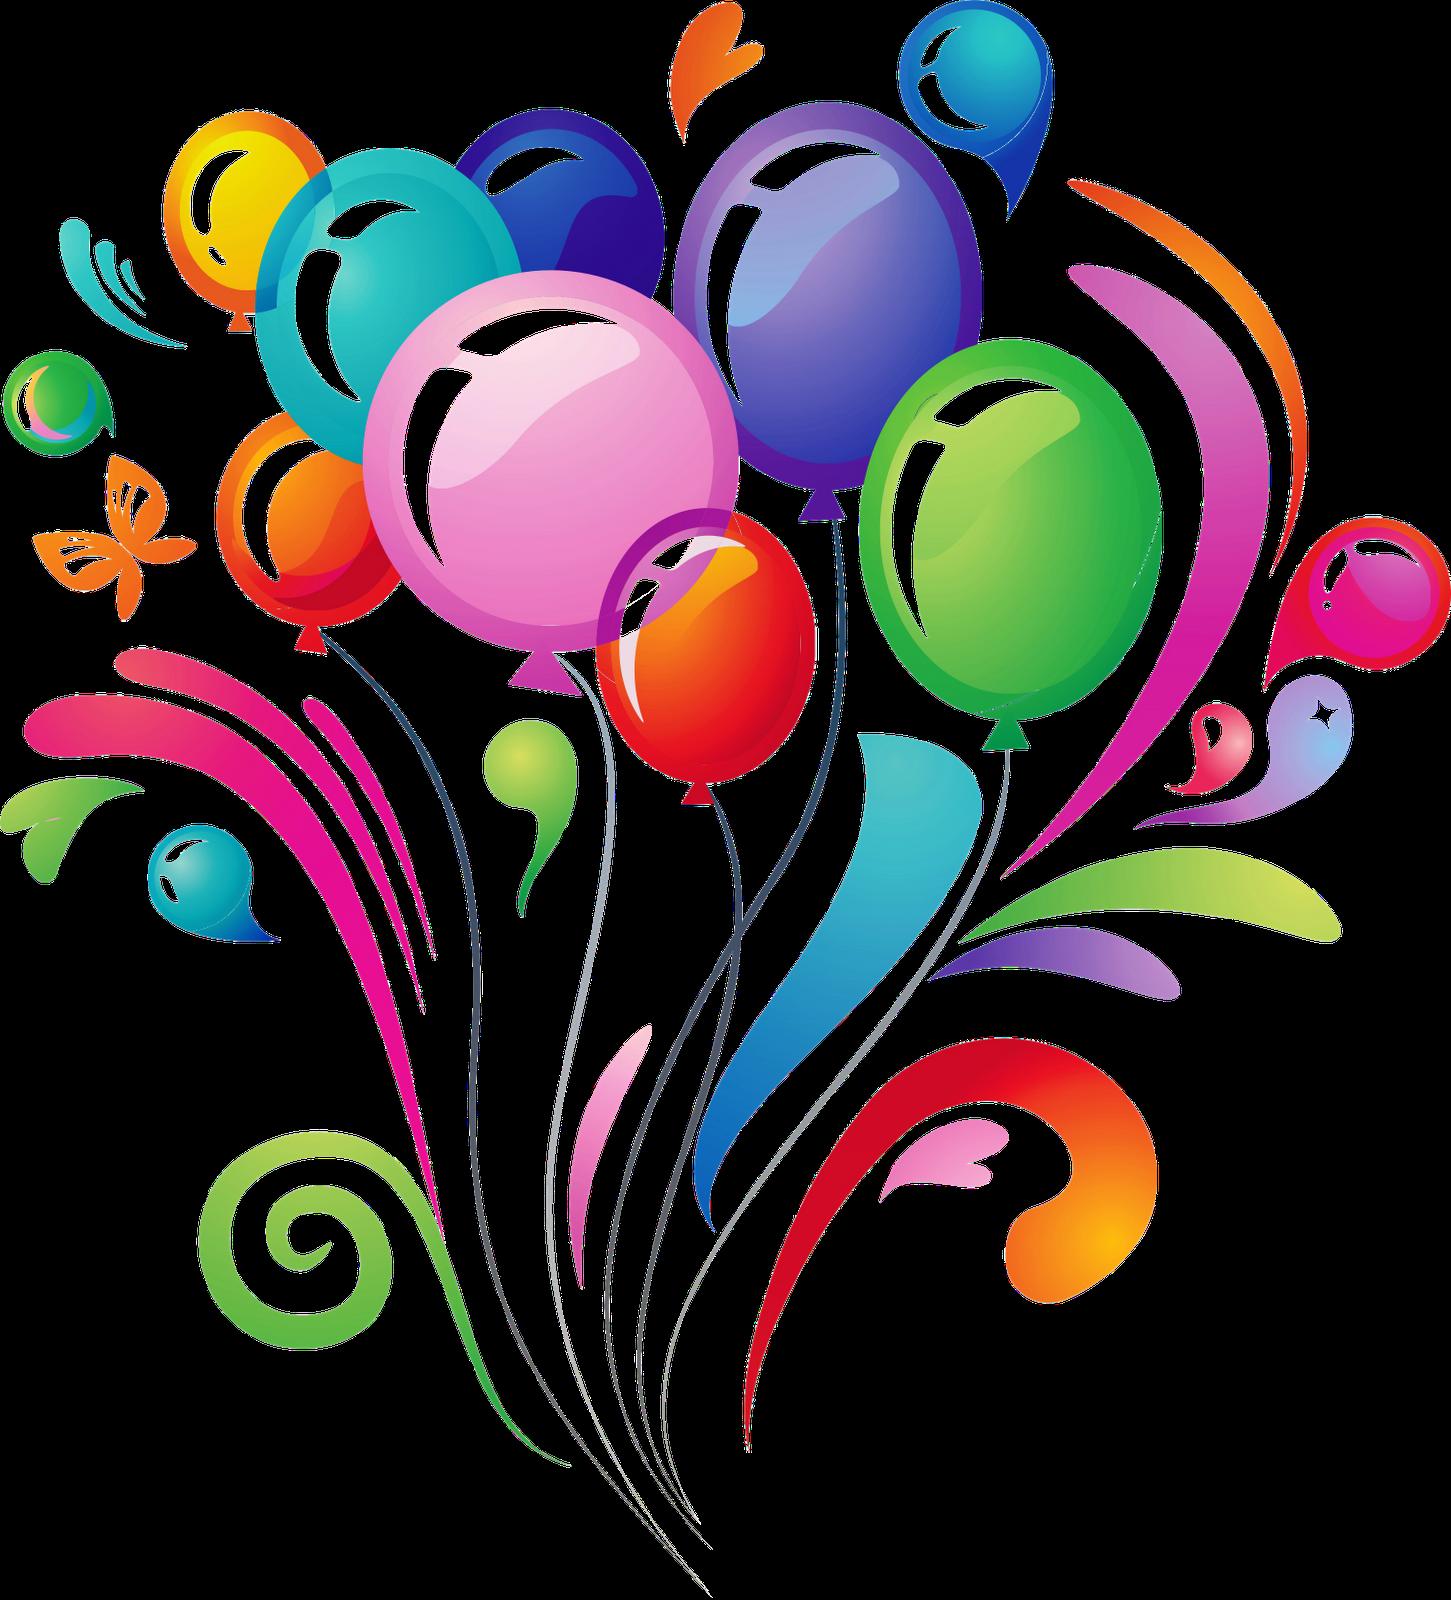 Birthday png the fizz. Congratulations clipart boss